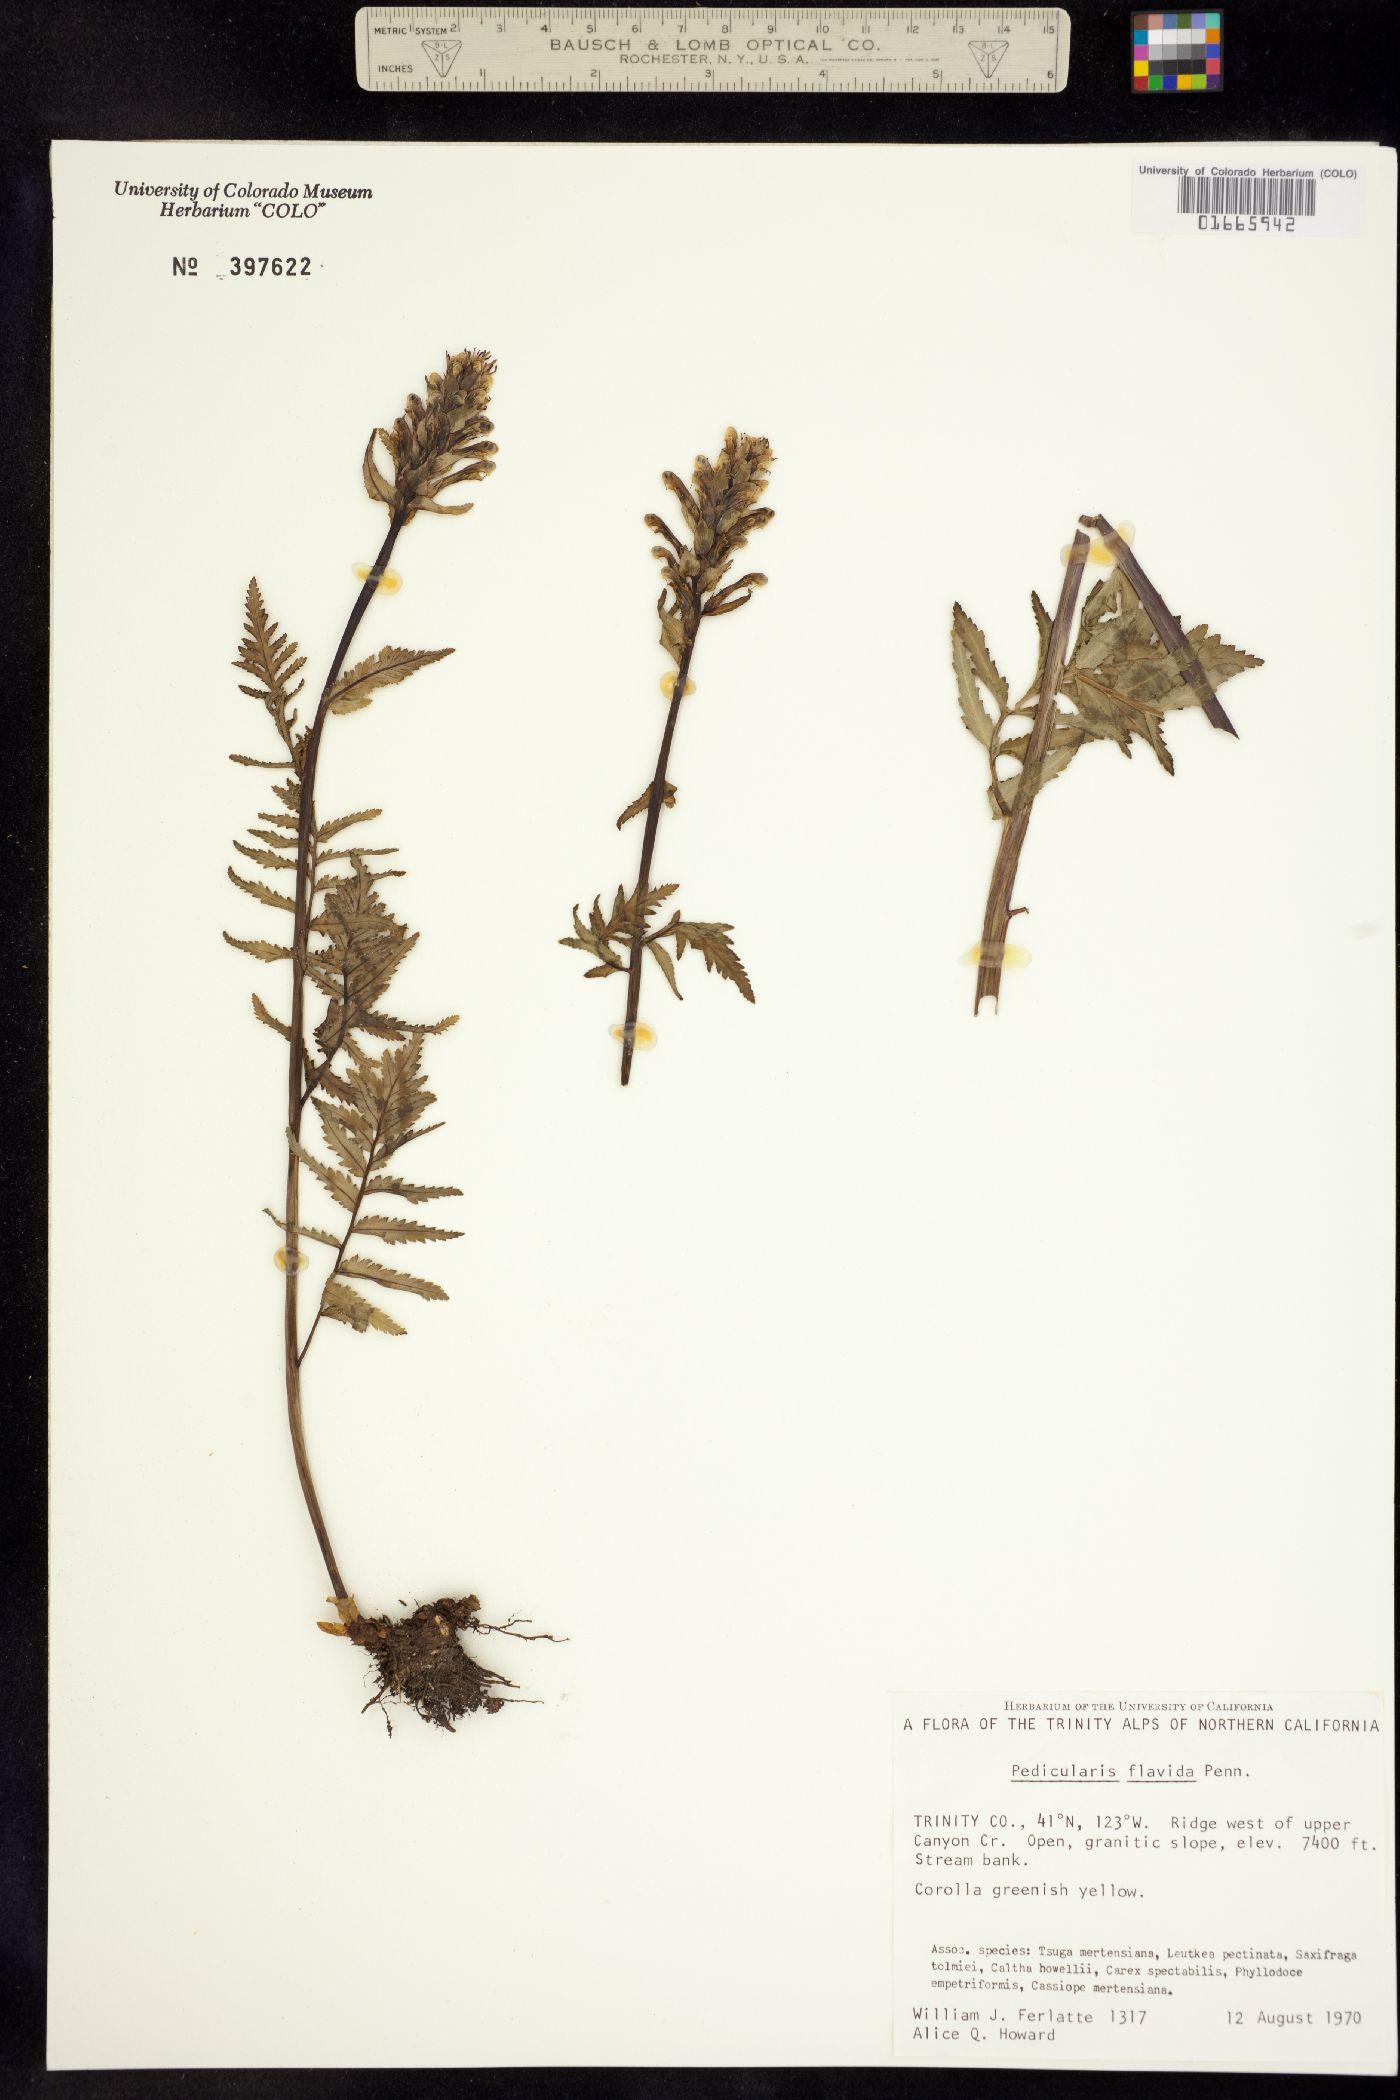 Pedicularis flavida image